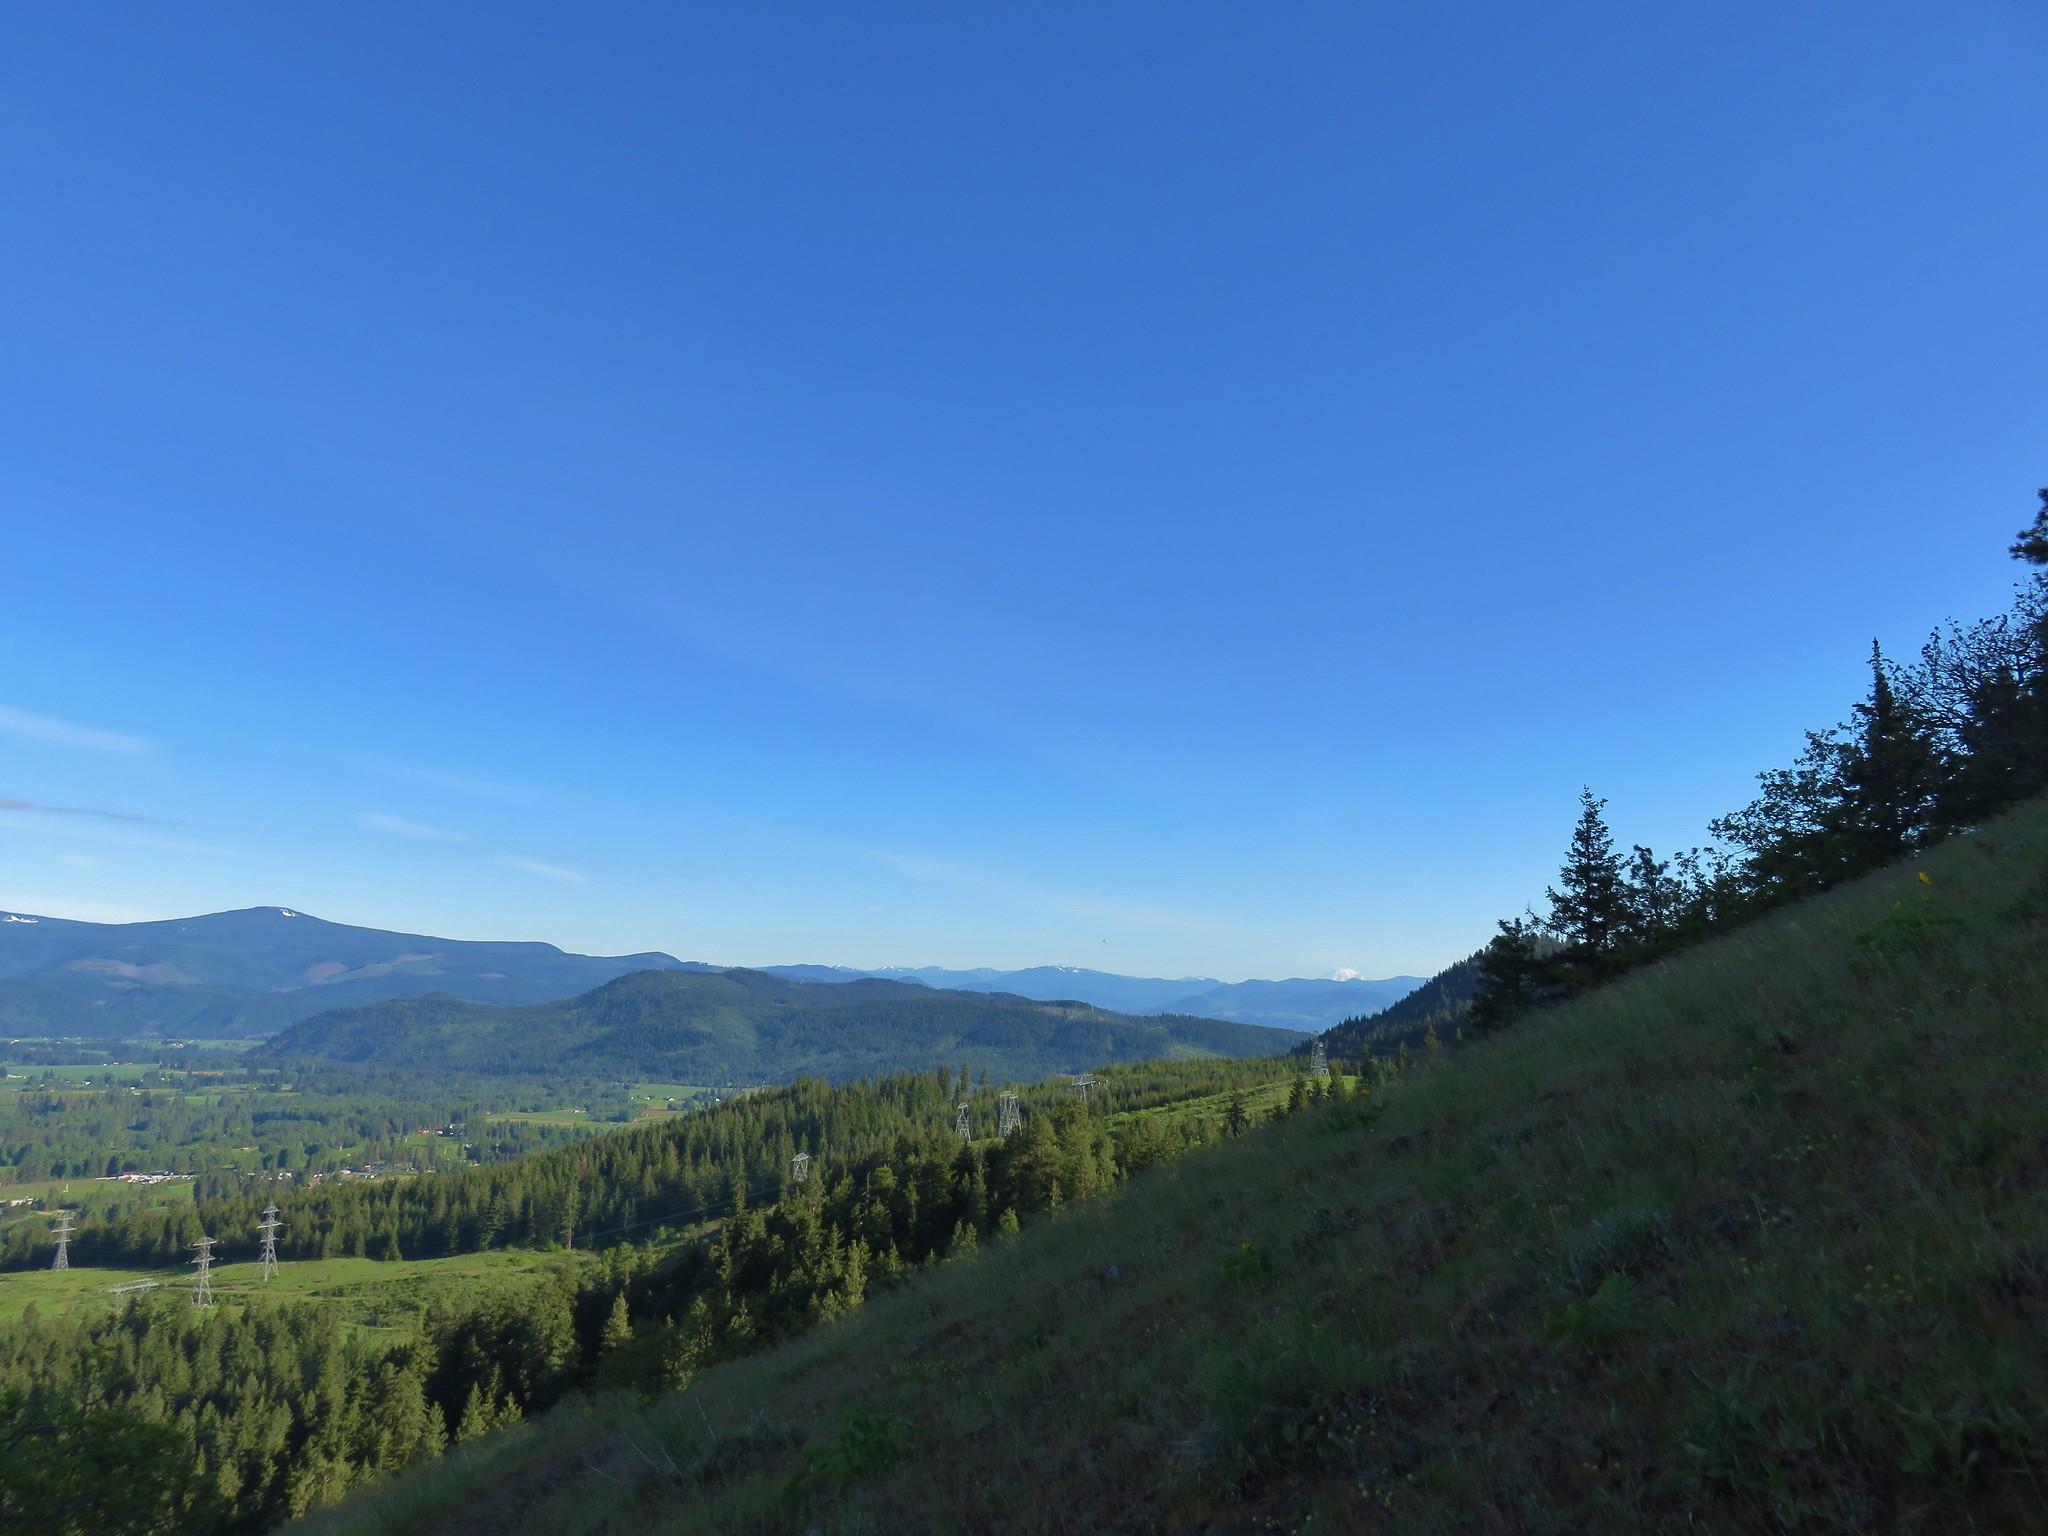 Mt. Rainier in the distance